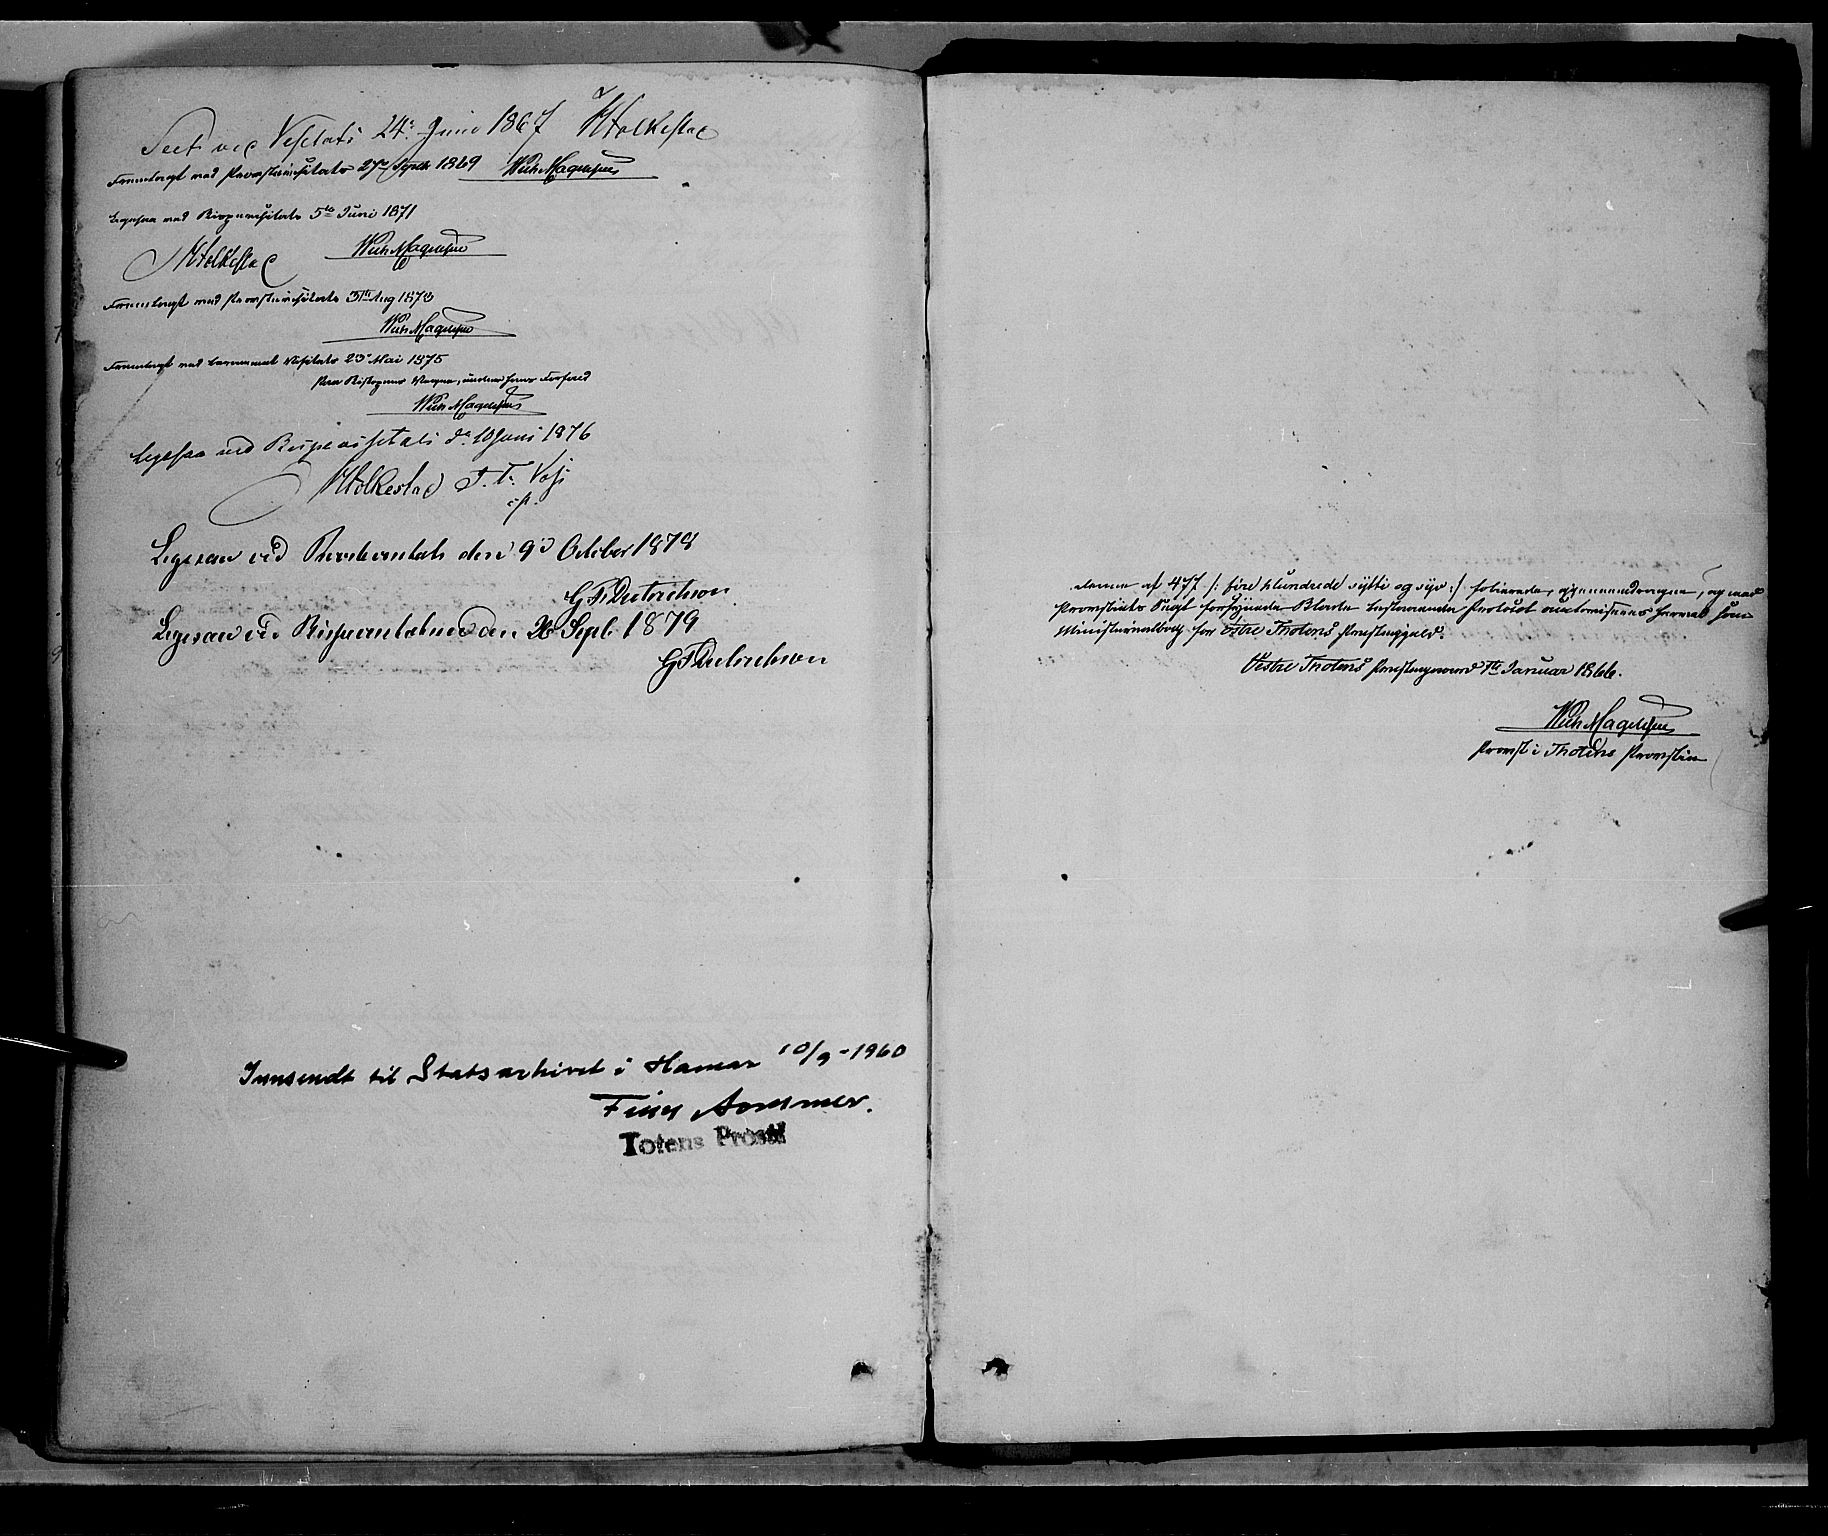 SAH, Østre Toten prestekontor, Ministerialbok nr. 5, 1866-1877